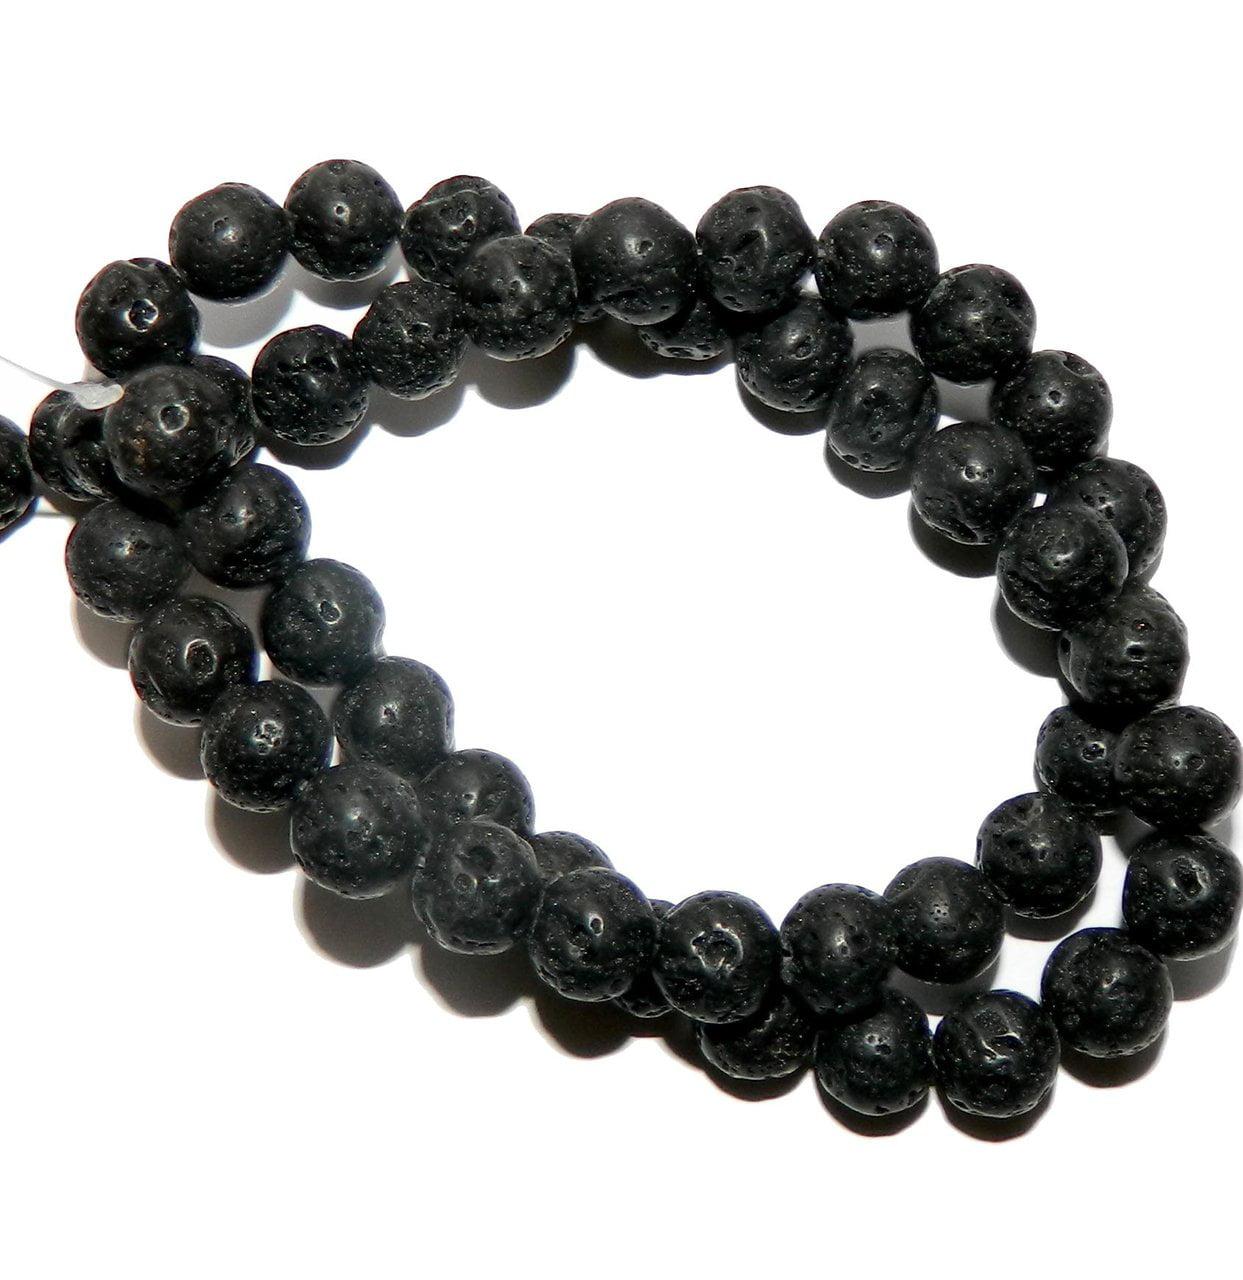 Black Volcanic Lava Beads 20mm Round Gemstone 15 Inch Strand